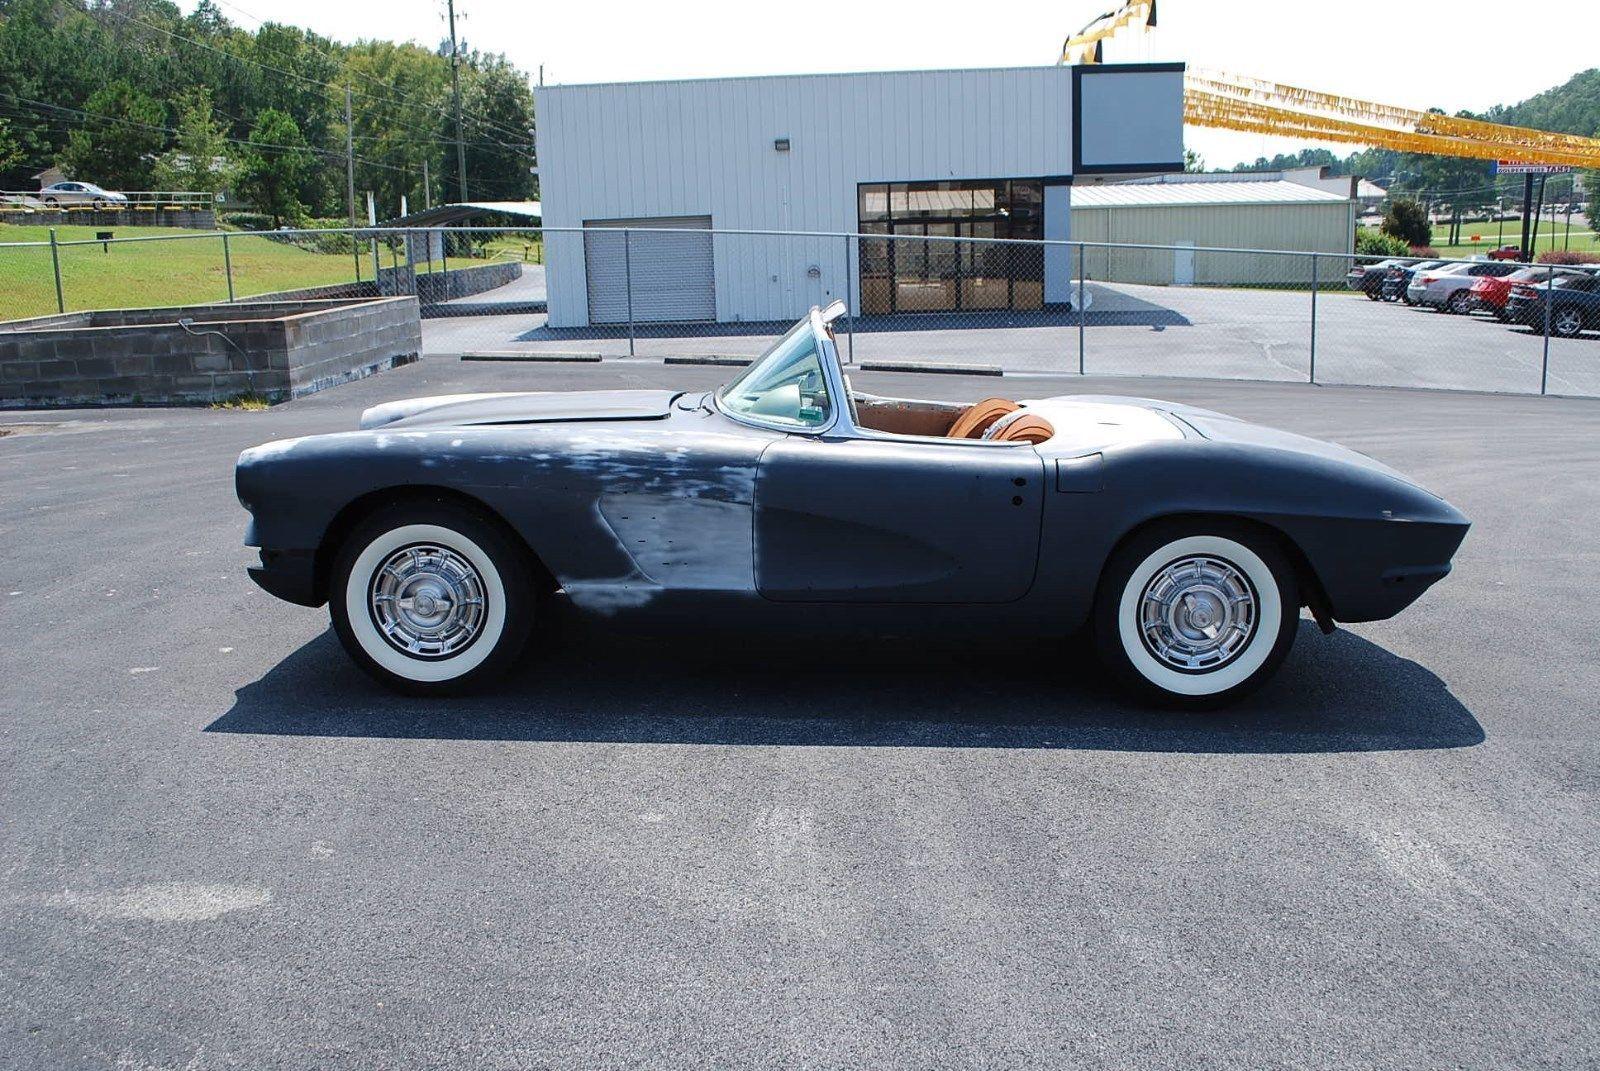 1961 Chevrolet Corvette Convertible Pinterest Chevy Stingray Project Car 1860000 15 Bids